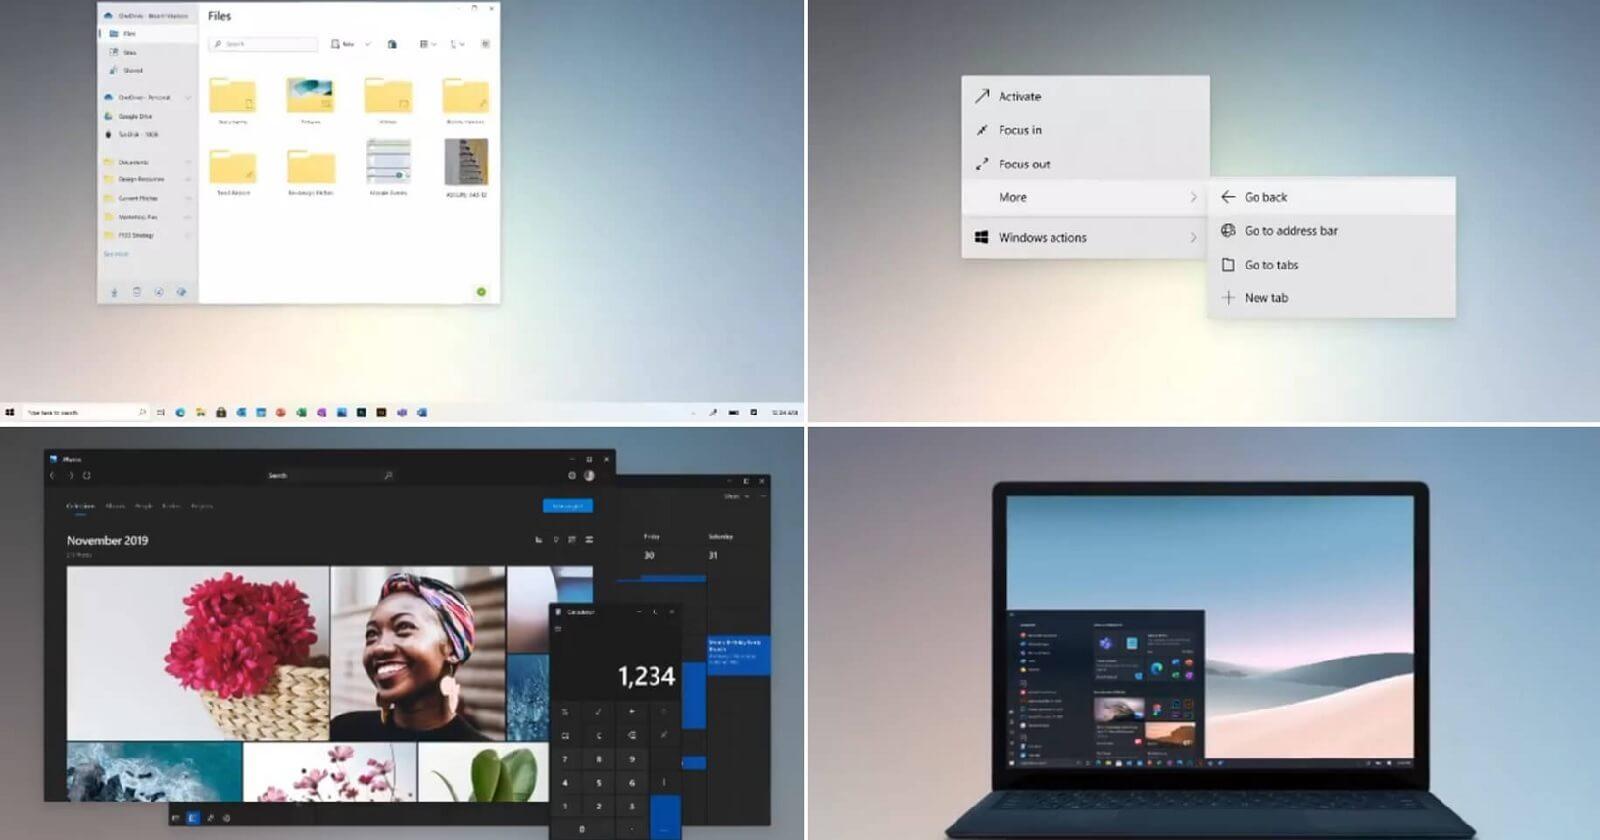 Windows 10 design teaser